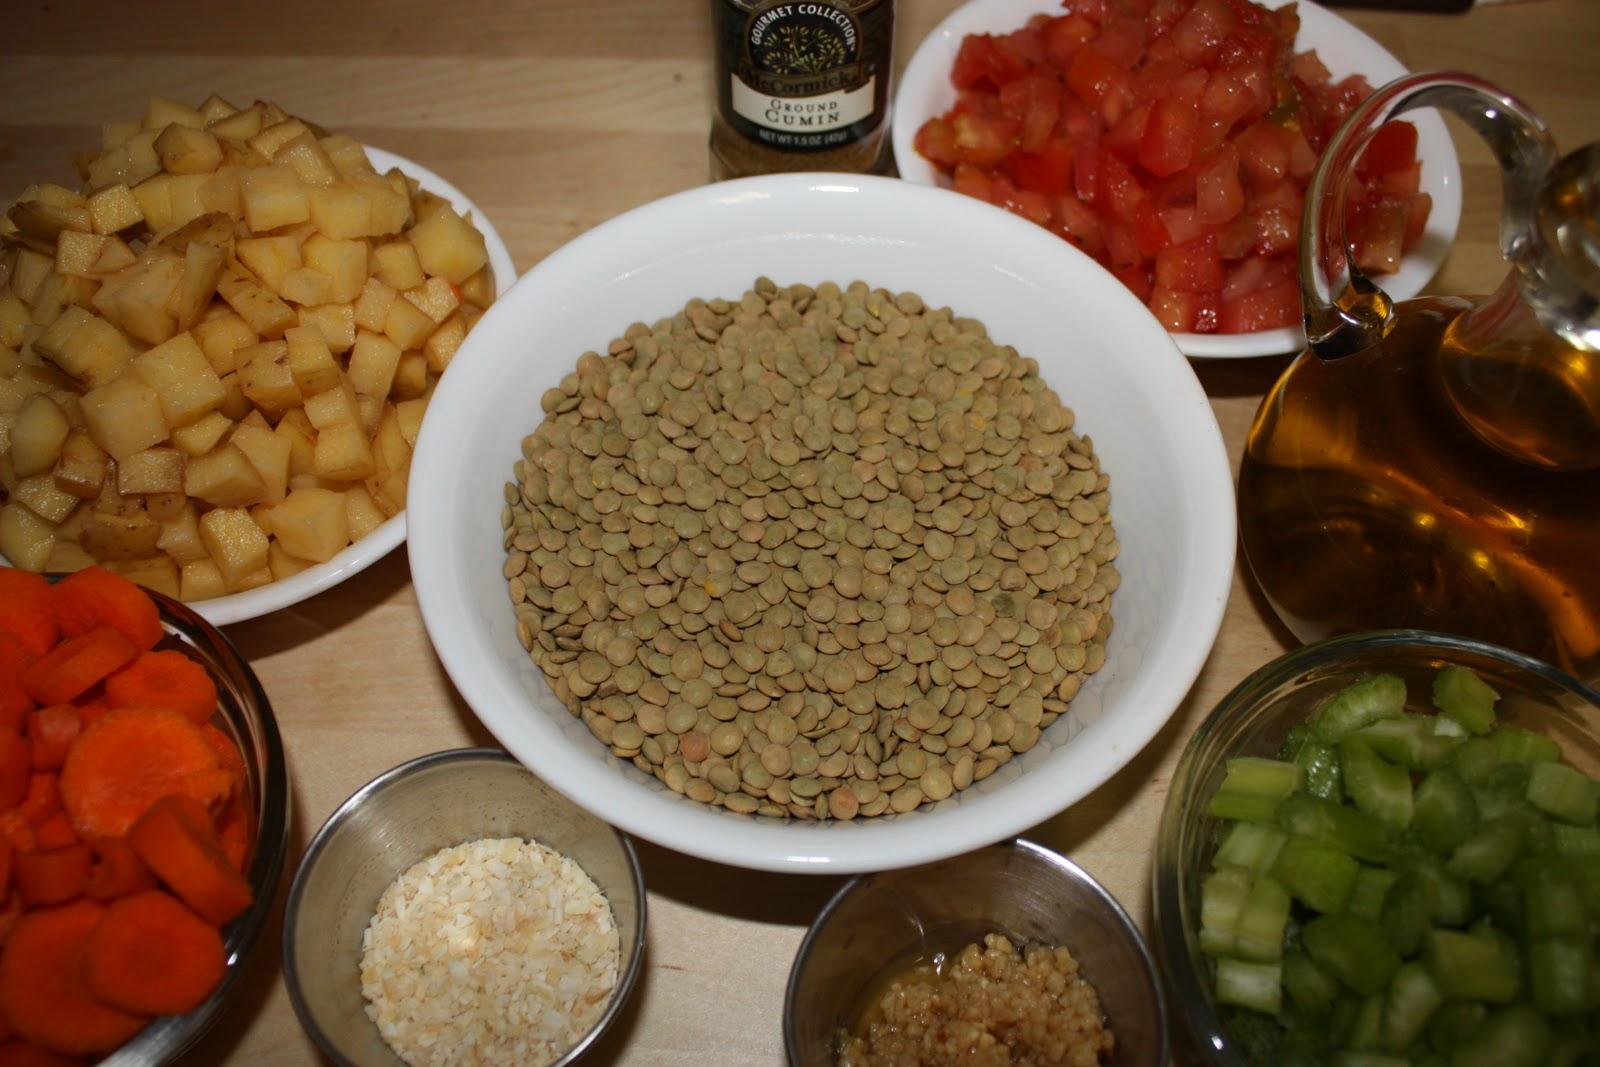 High Folate Foods Mayo Clinic